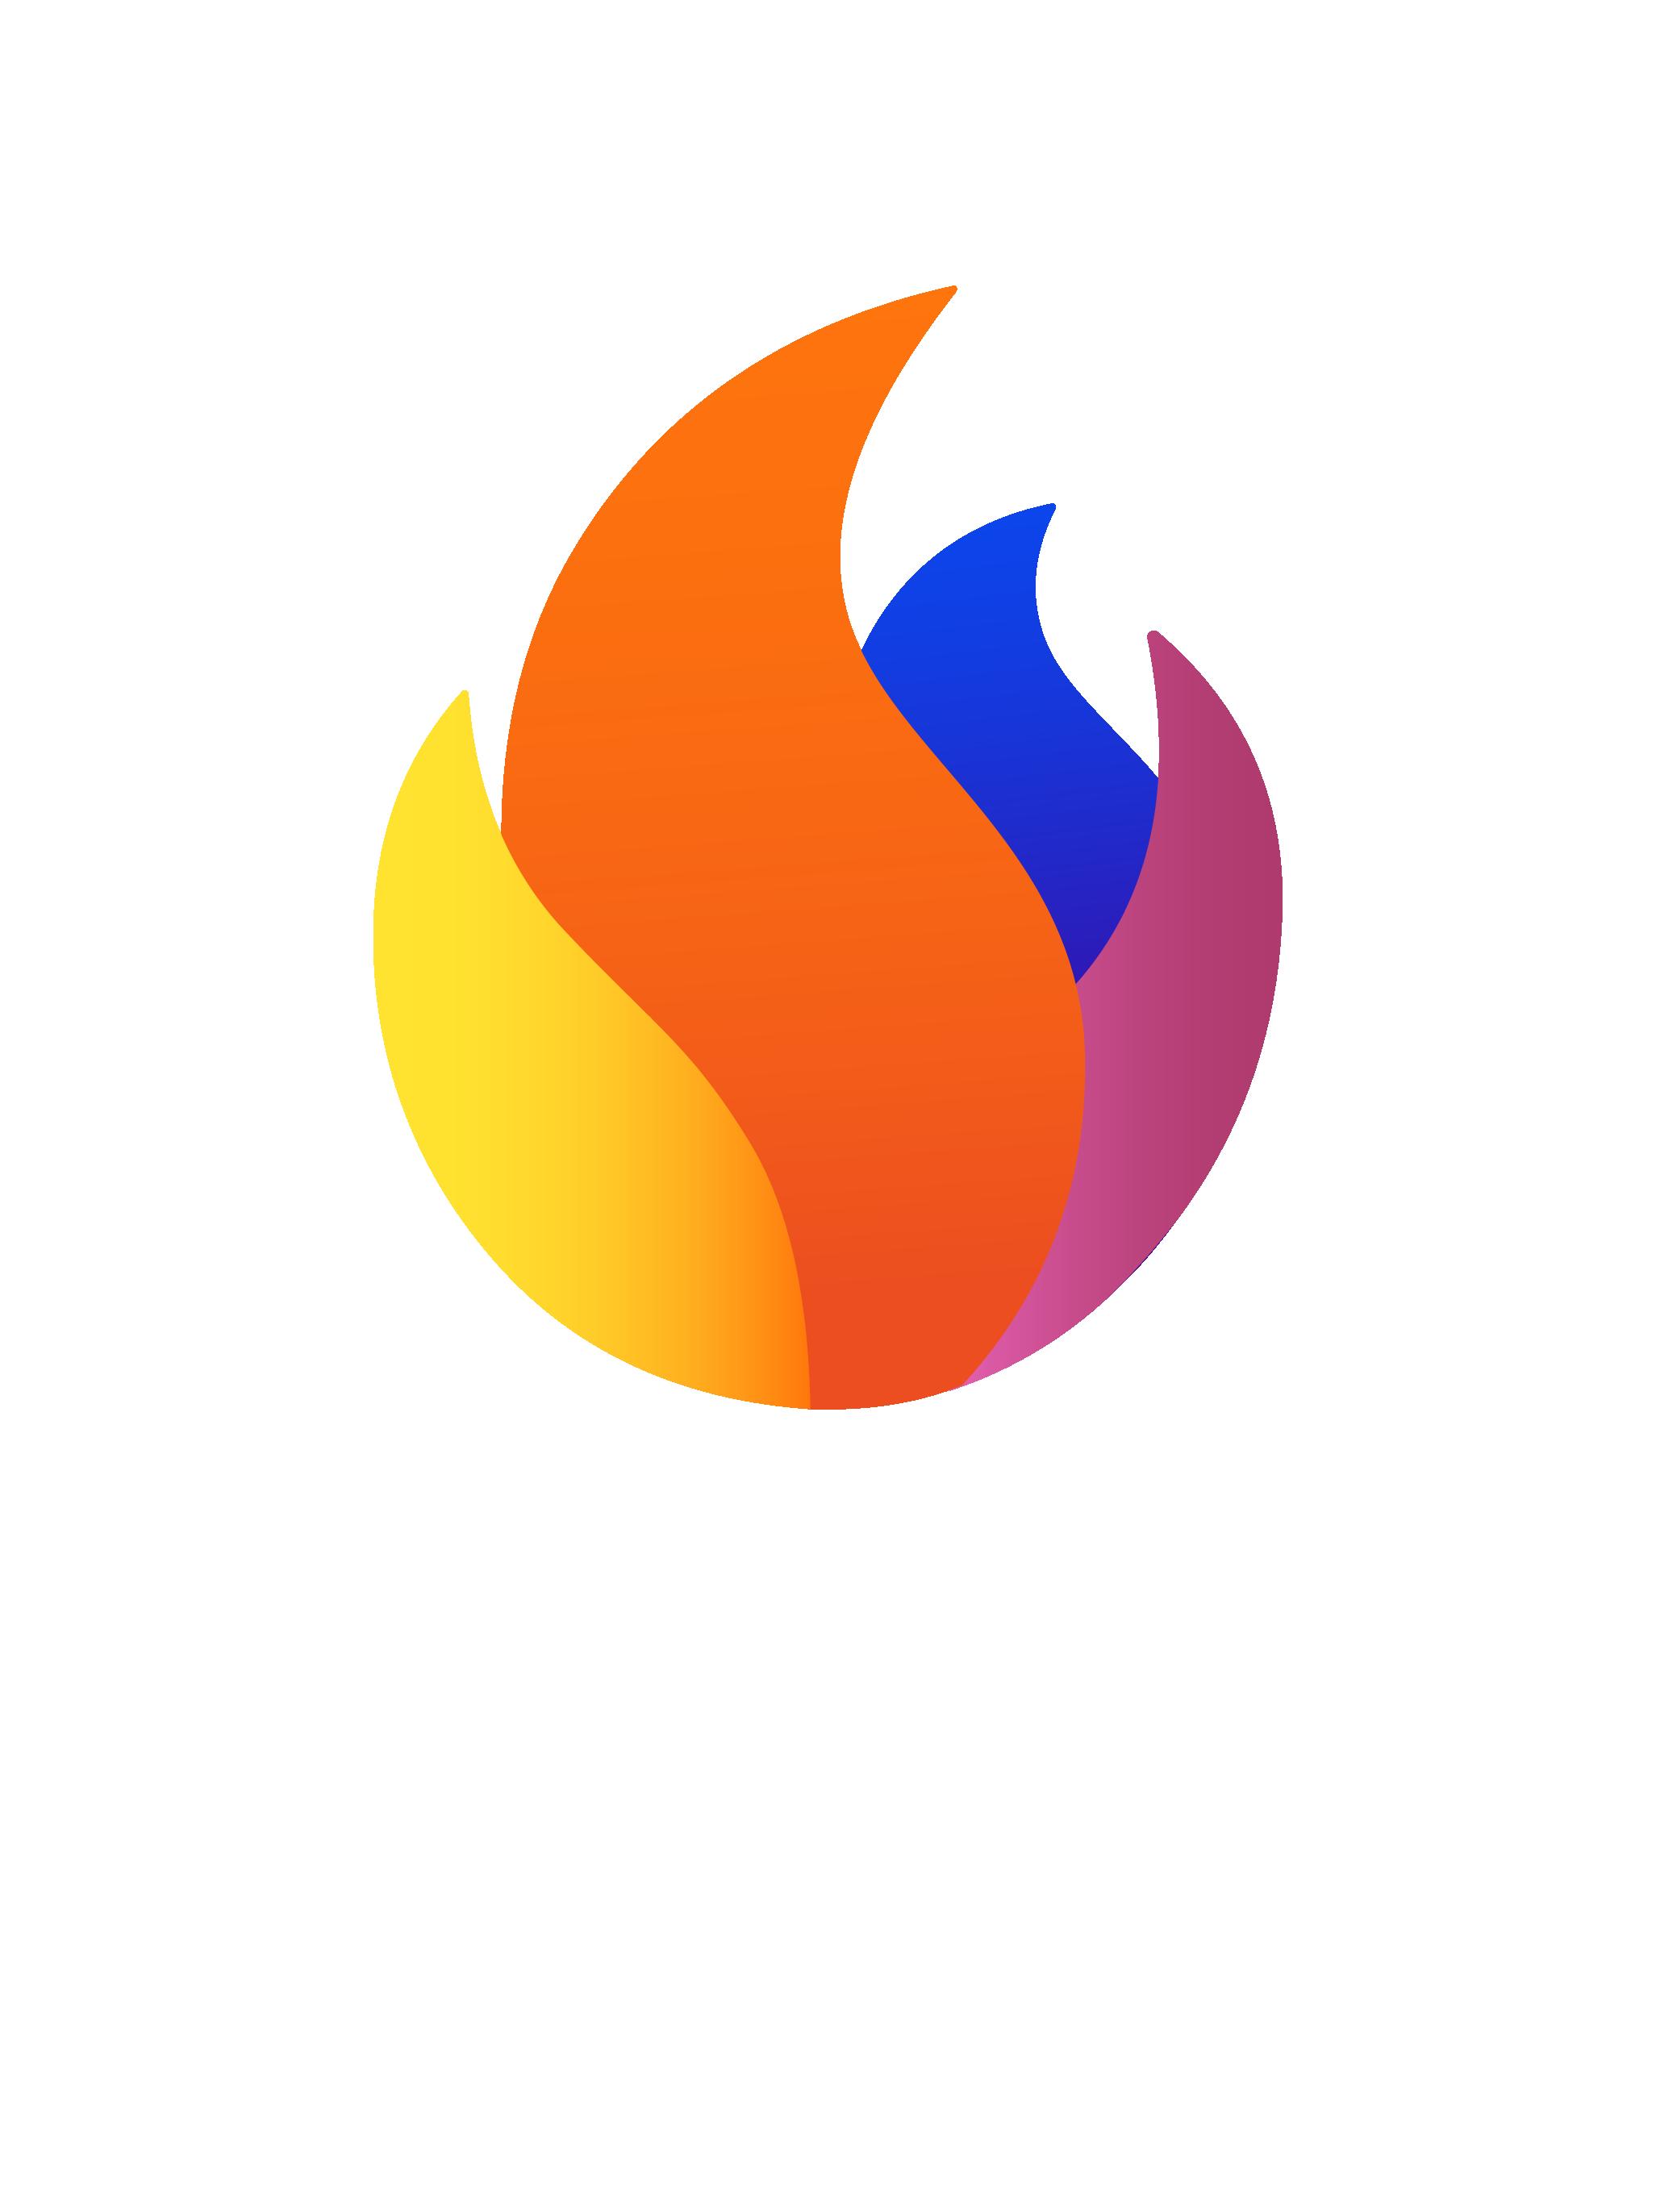 Fire-Film-design_3-04